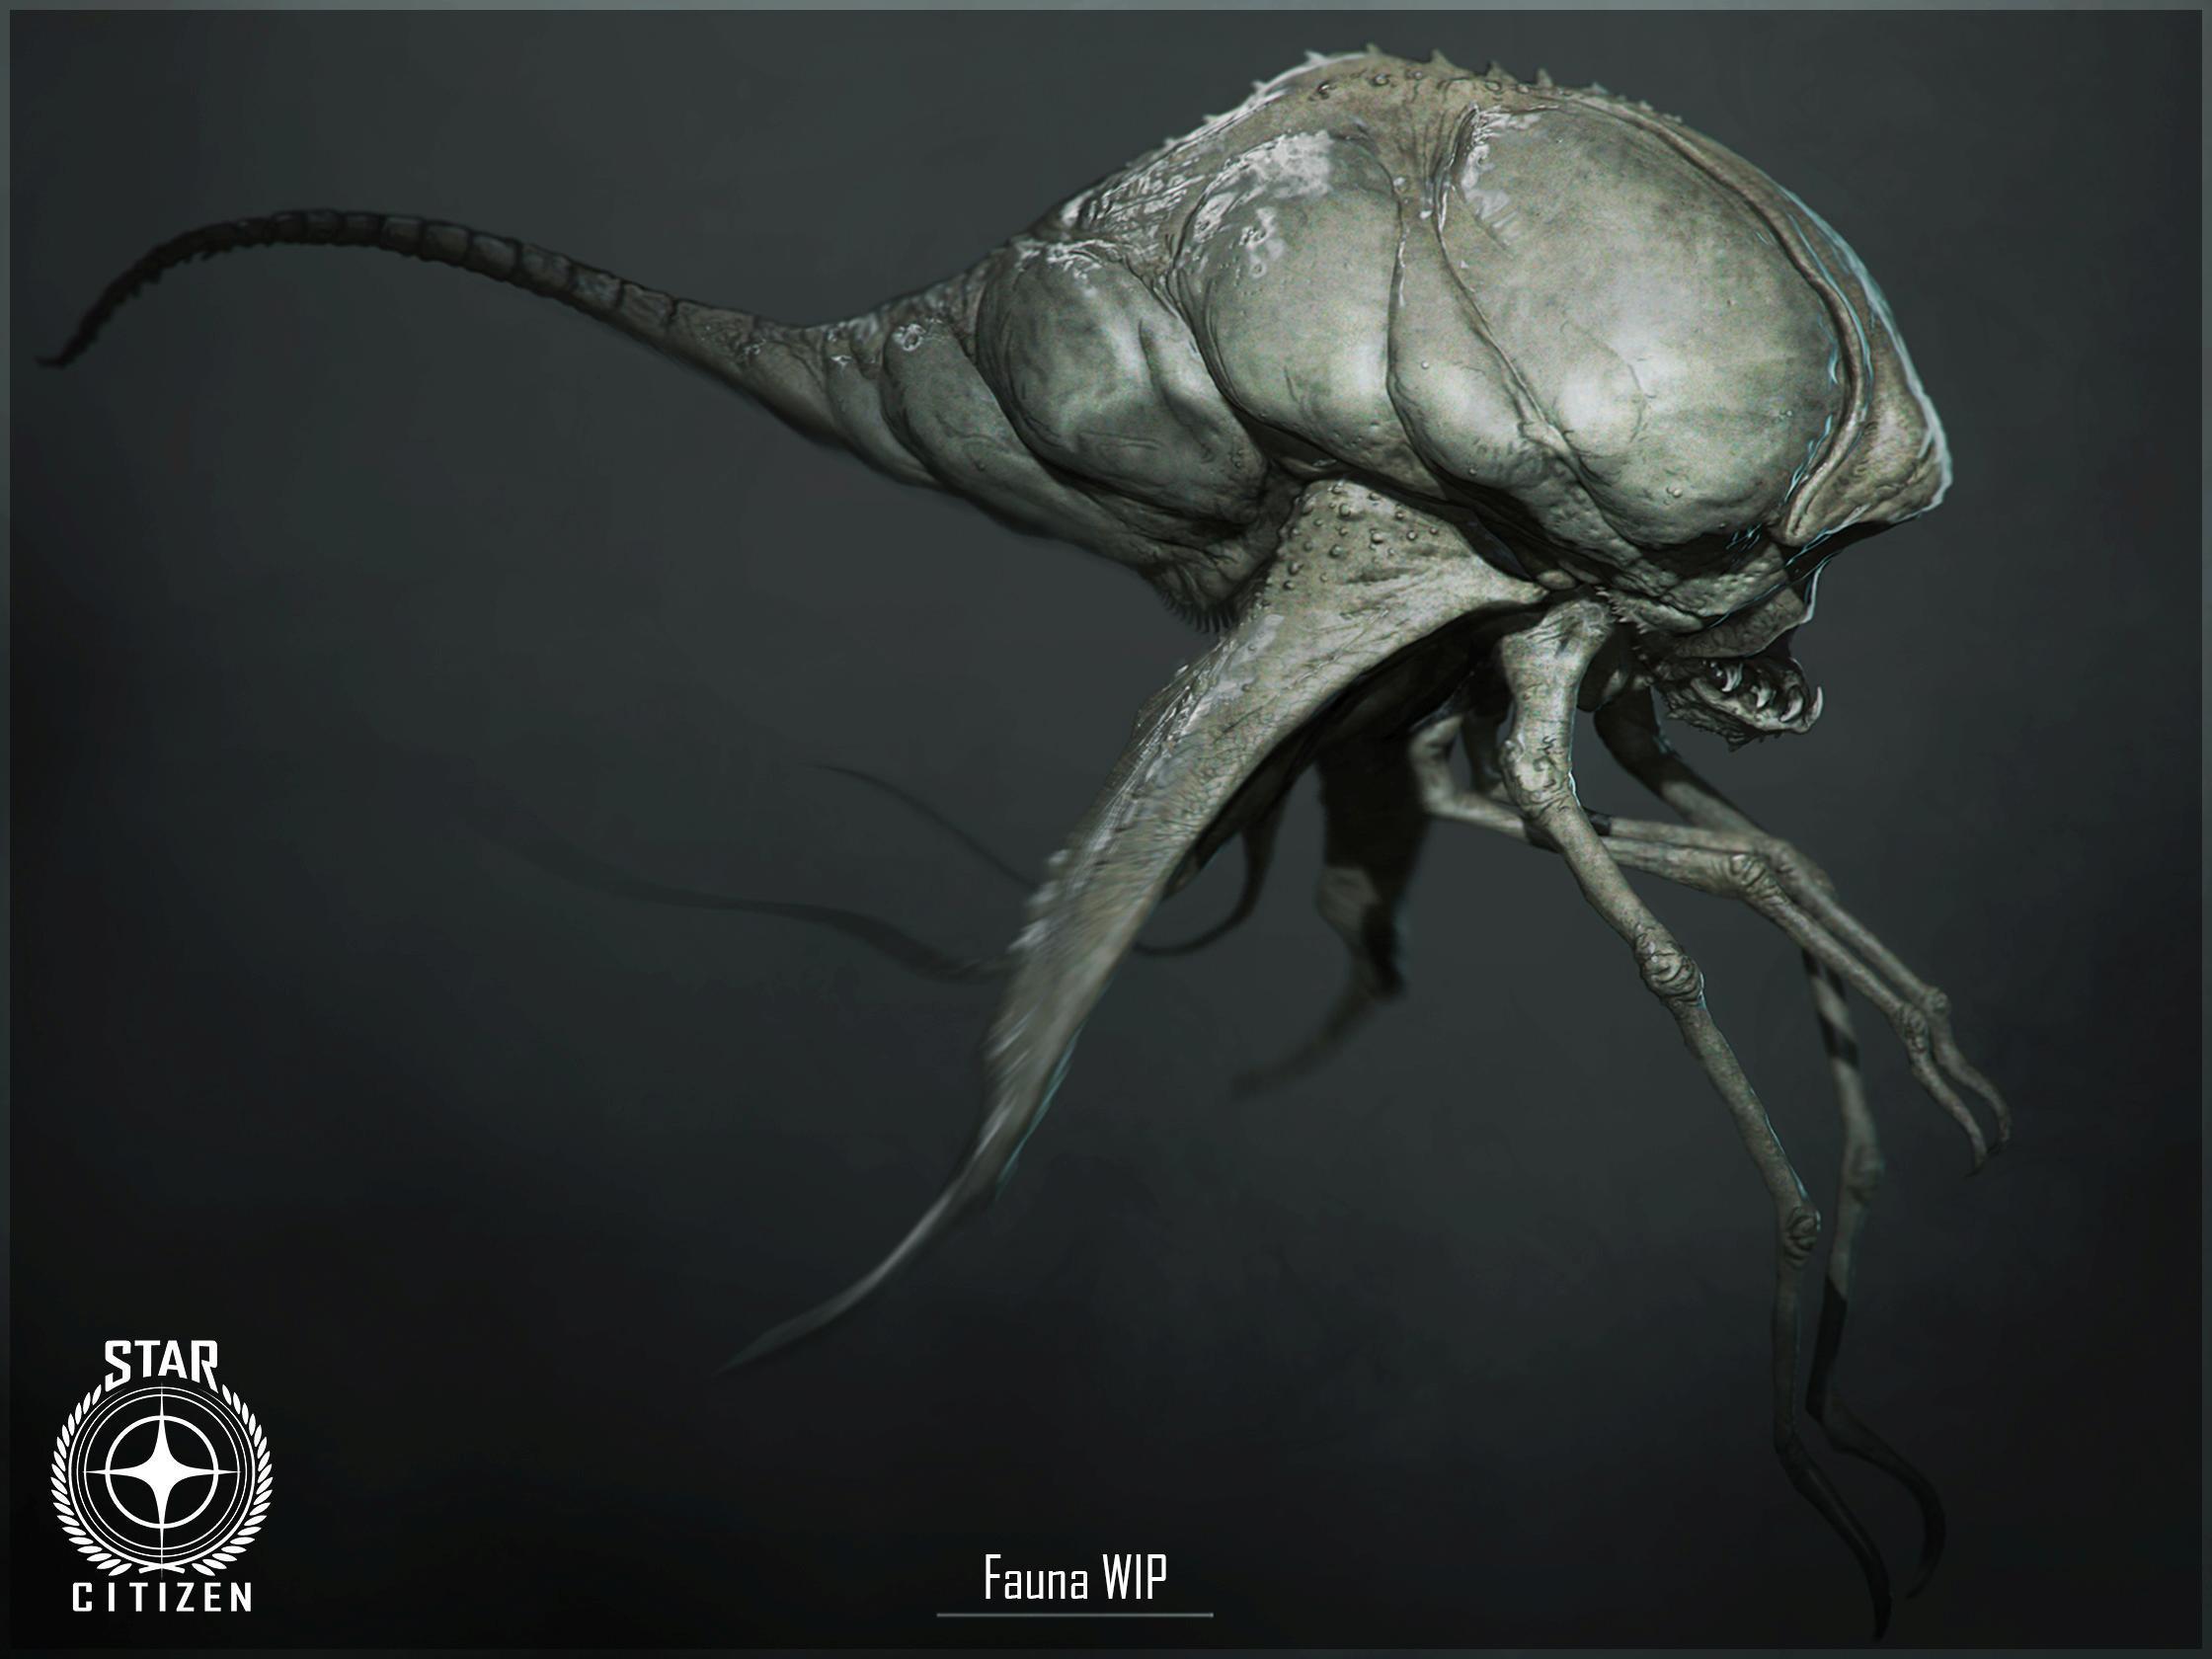 Fauna WIP - Character Sneak Peek